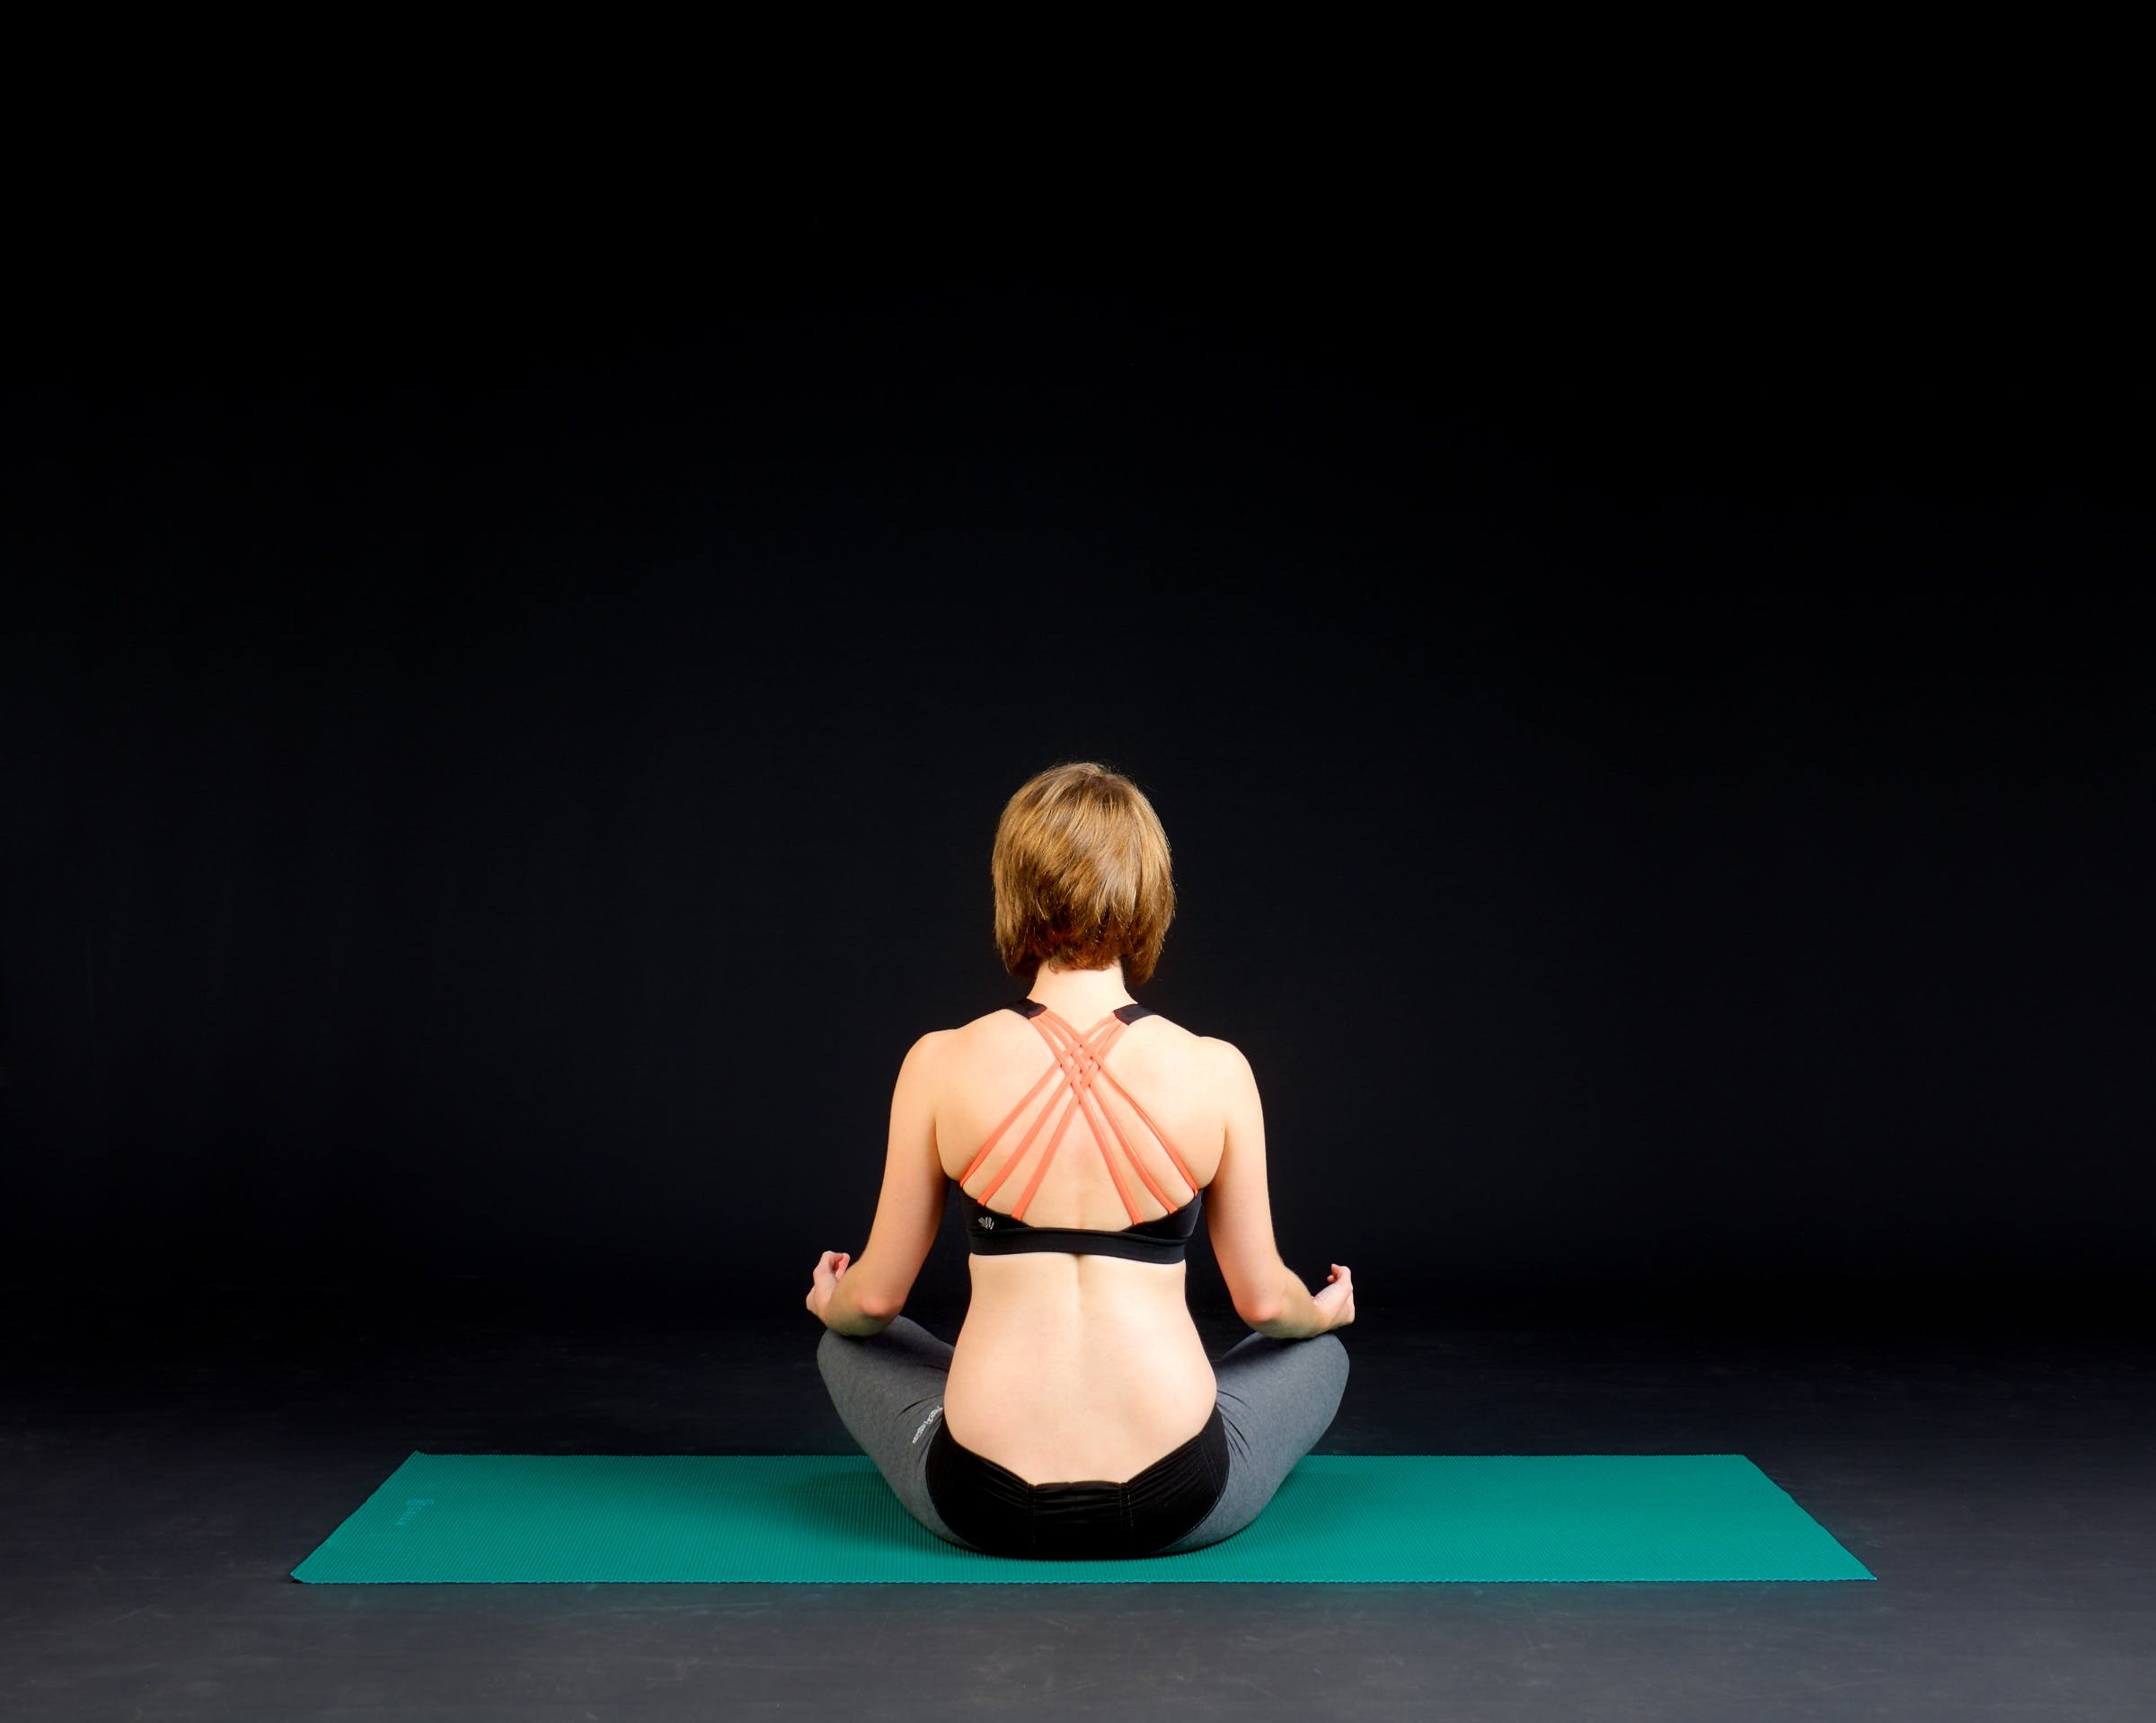 active, balance, body